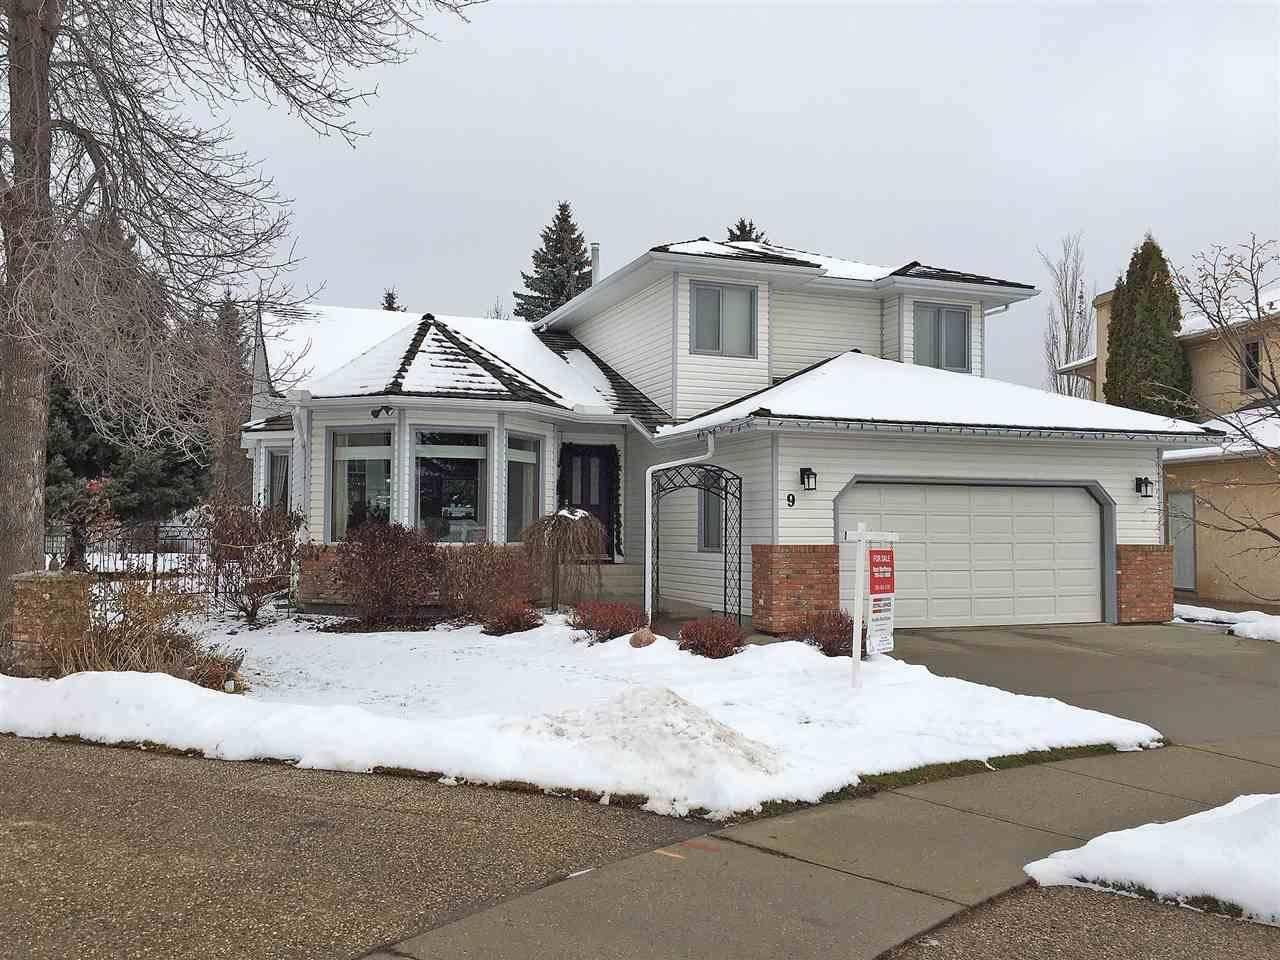 House for sale at 9 Essex Cs St. Albert Alberta - MLS: E4190609